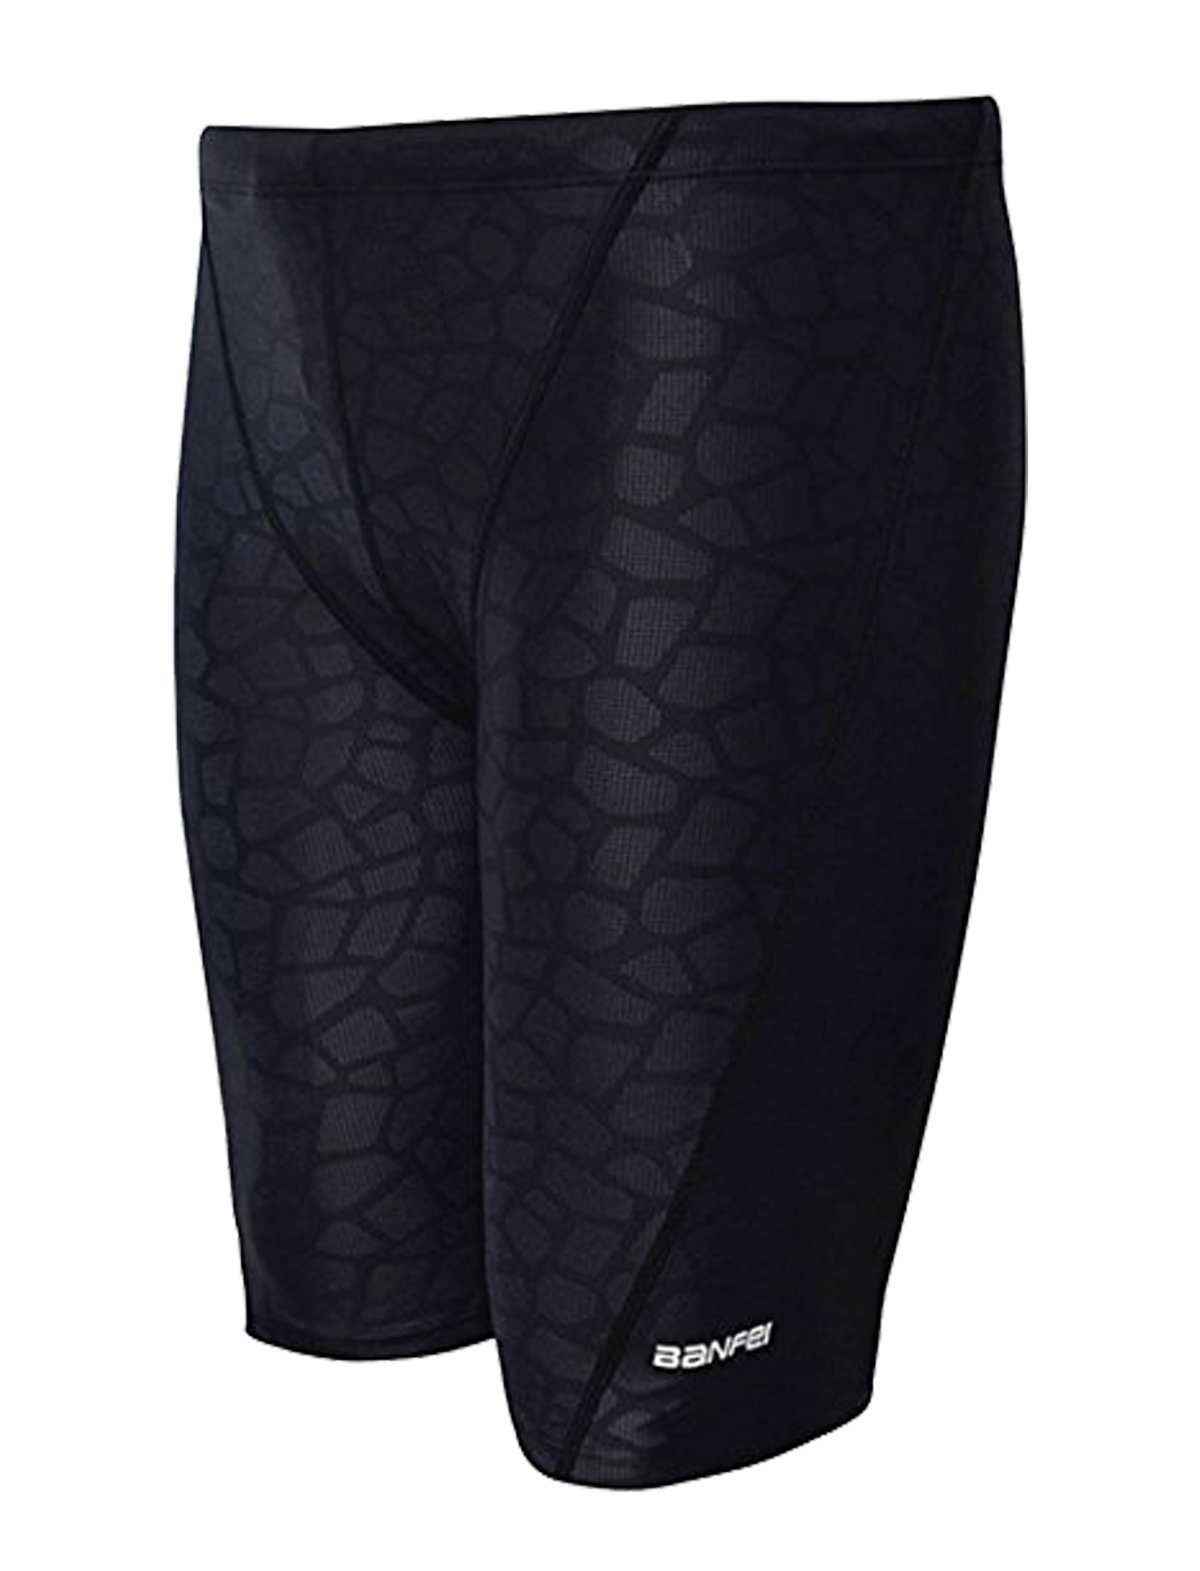 IMATE Men's Quick Dry Solid Square Leg Swimsuit (US XS/Tag L (Waist 27-29''), Black Prints)... by IMATE